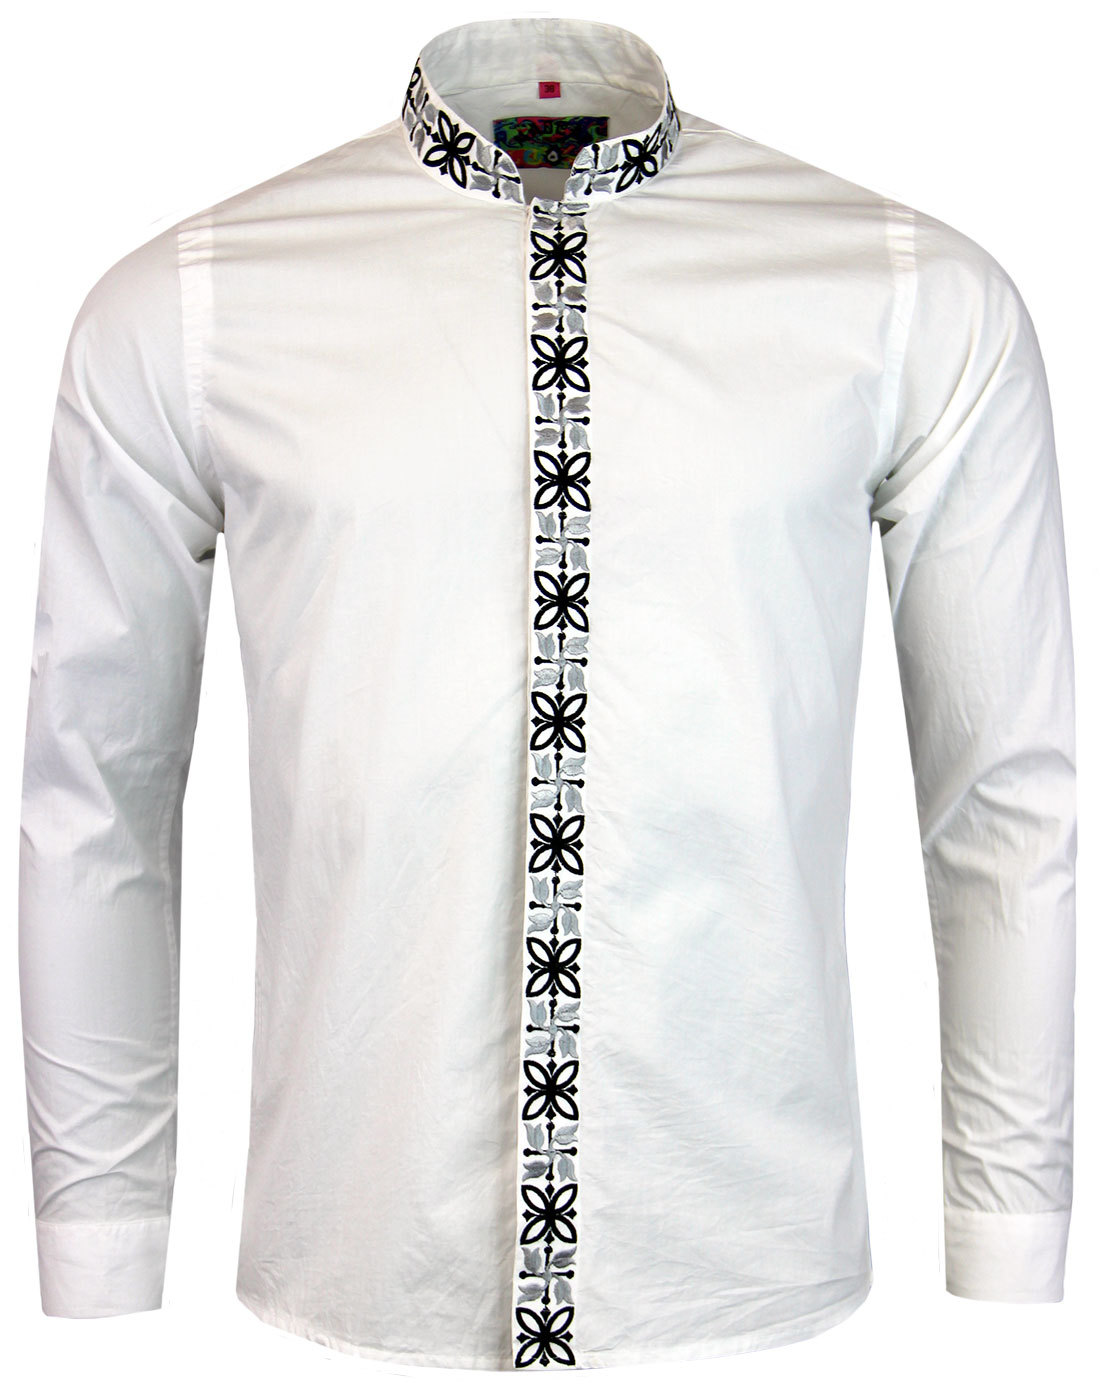 madcap england avory mandarin collar shirt white